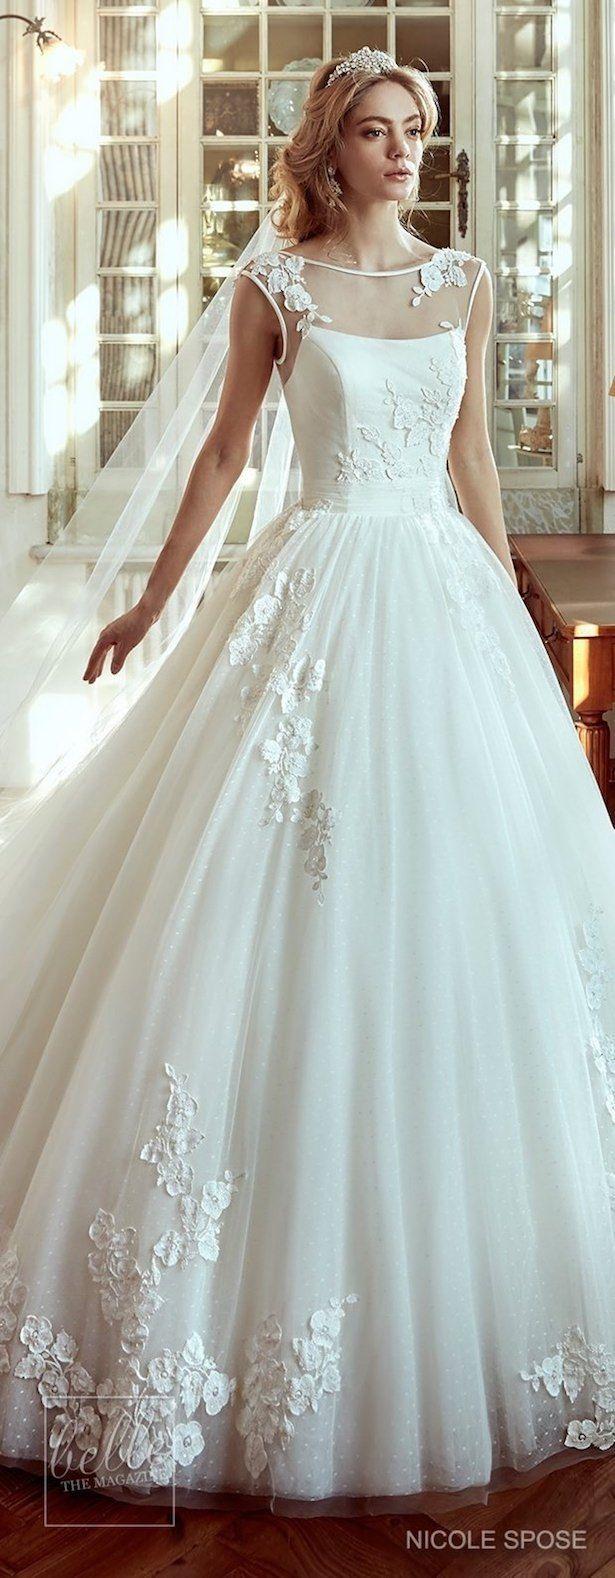 Nicole Spose Wedding Dress Collection 2017 | Illusion neckline ...